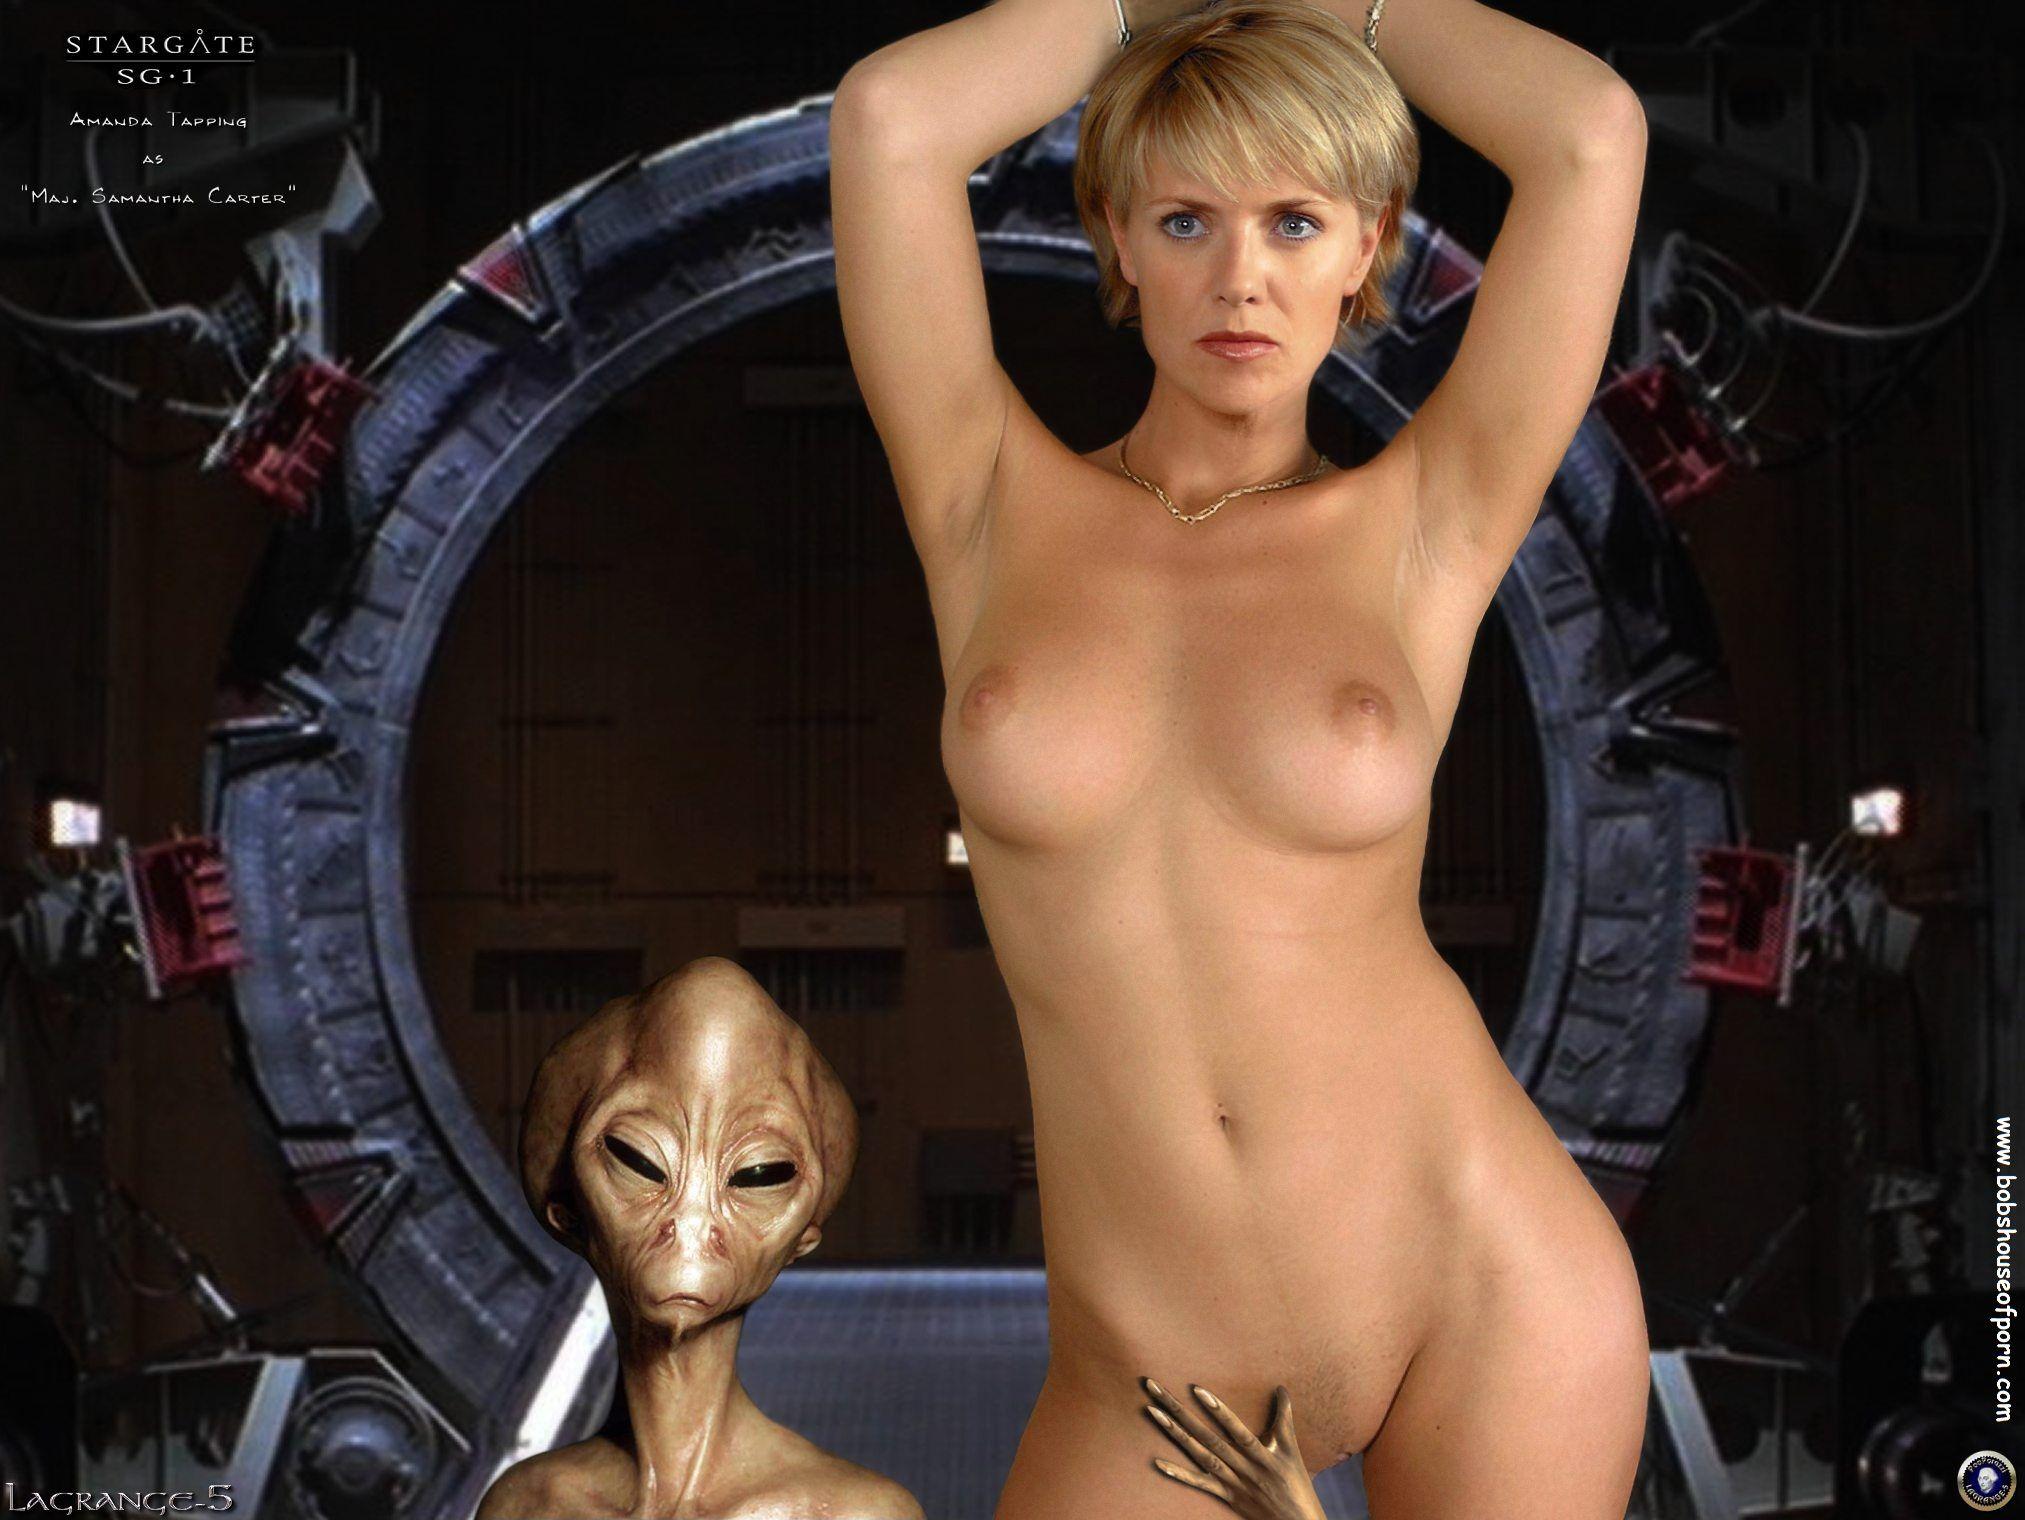 Samantha carter nude